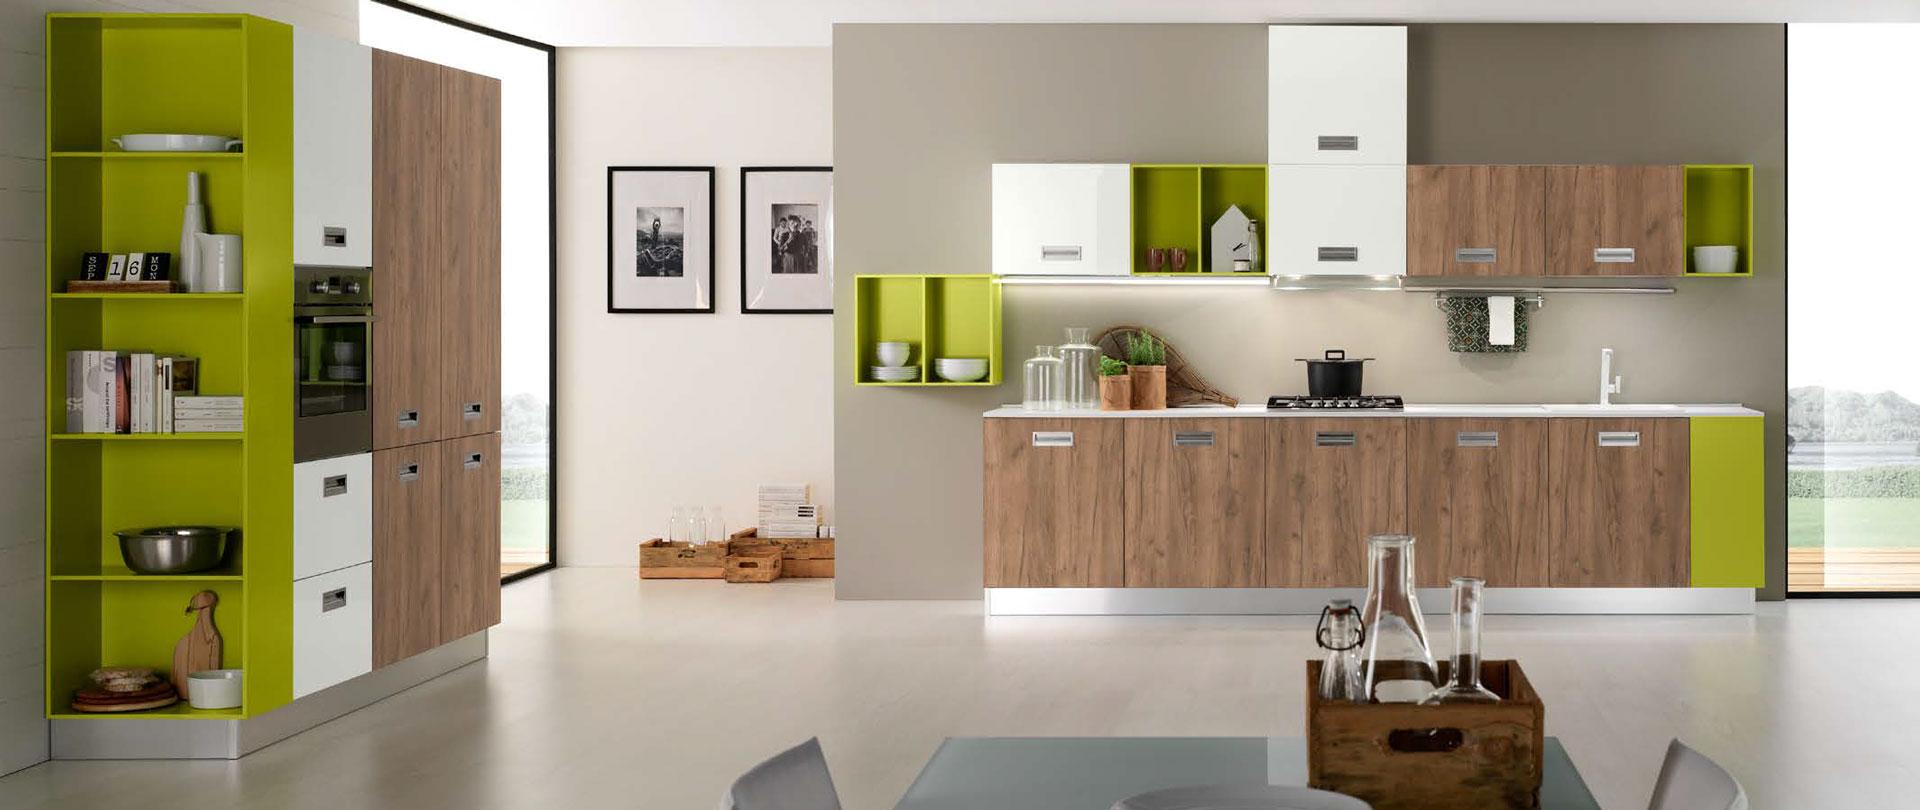 Cucine moderne cucinissima for Cucine moderne piccole prezzi